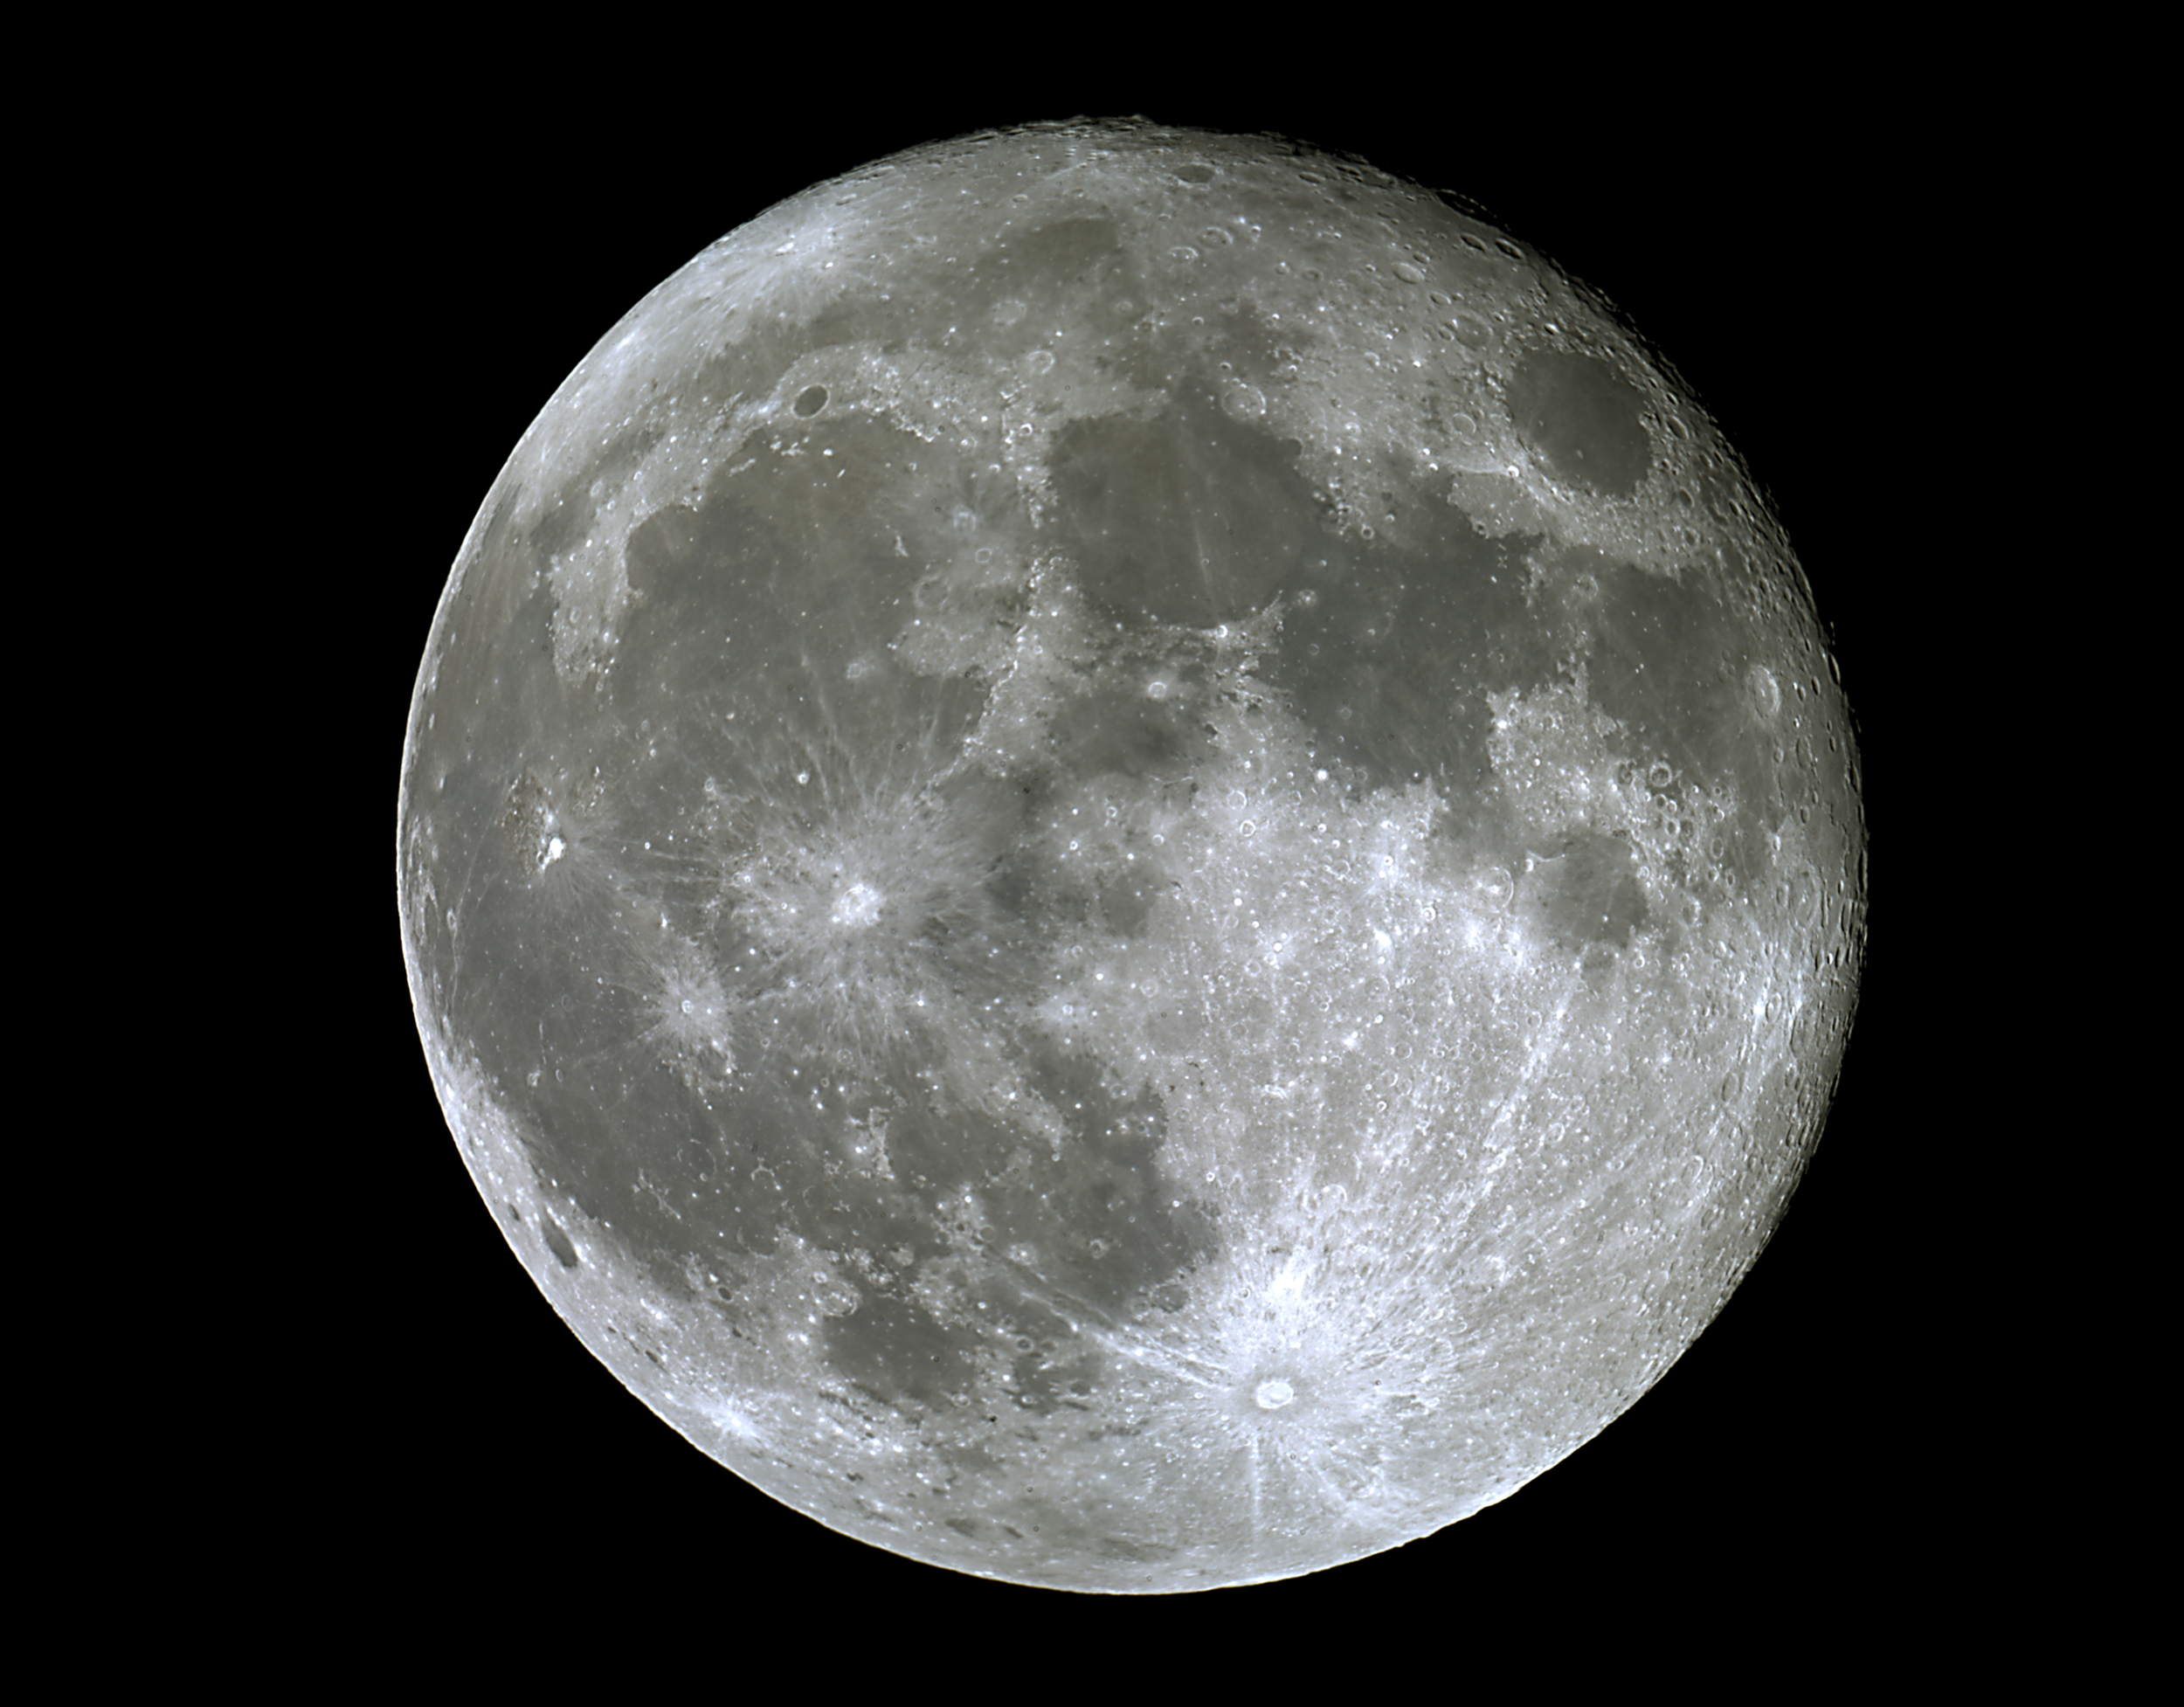 Moon (1 day past full)